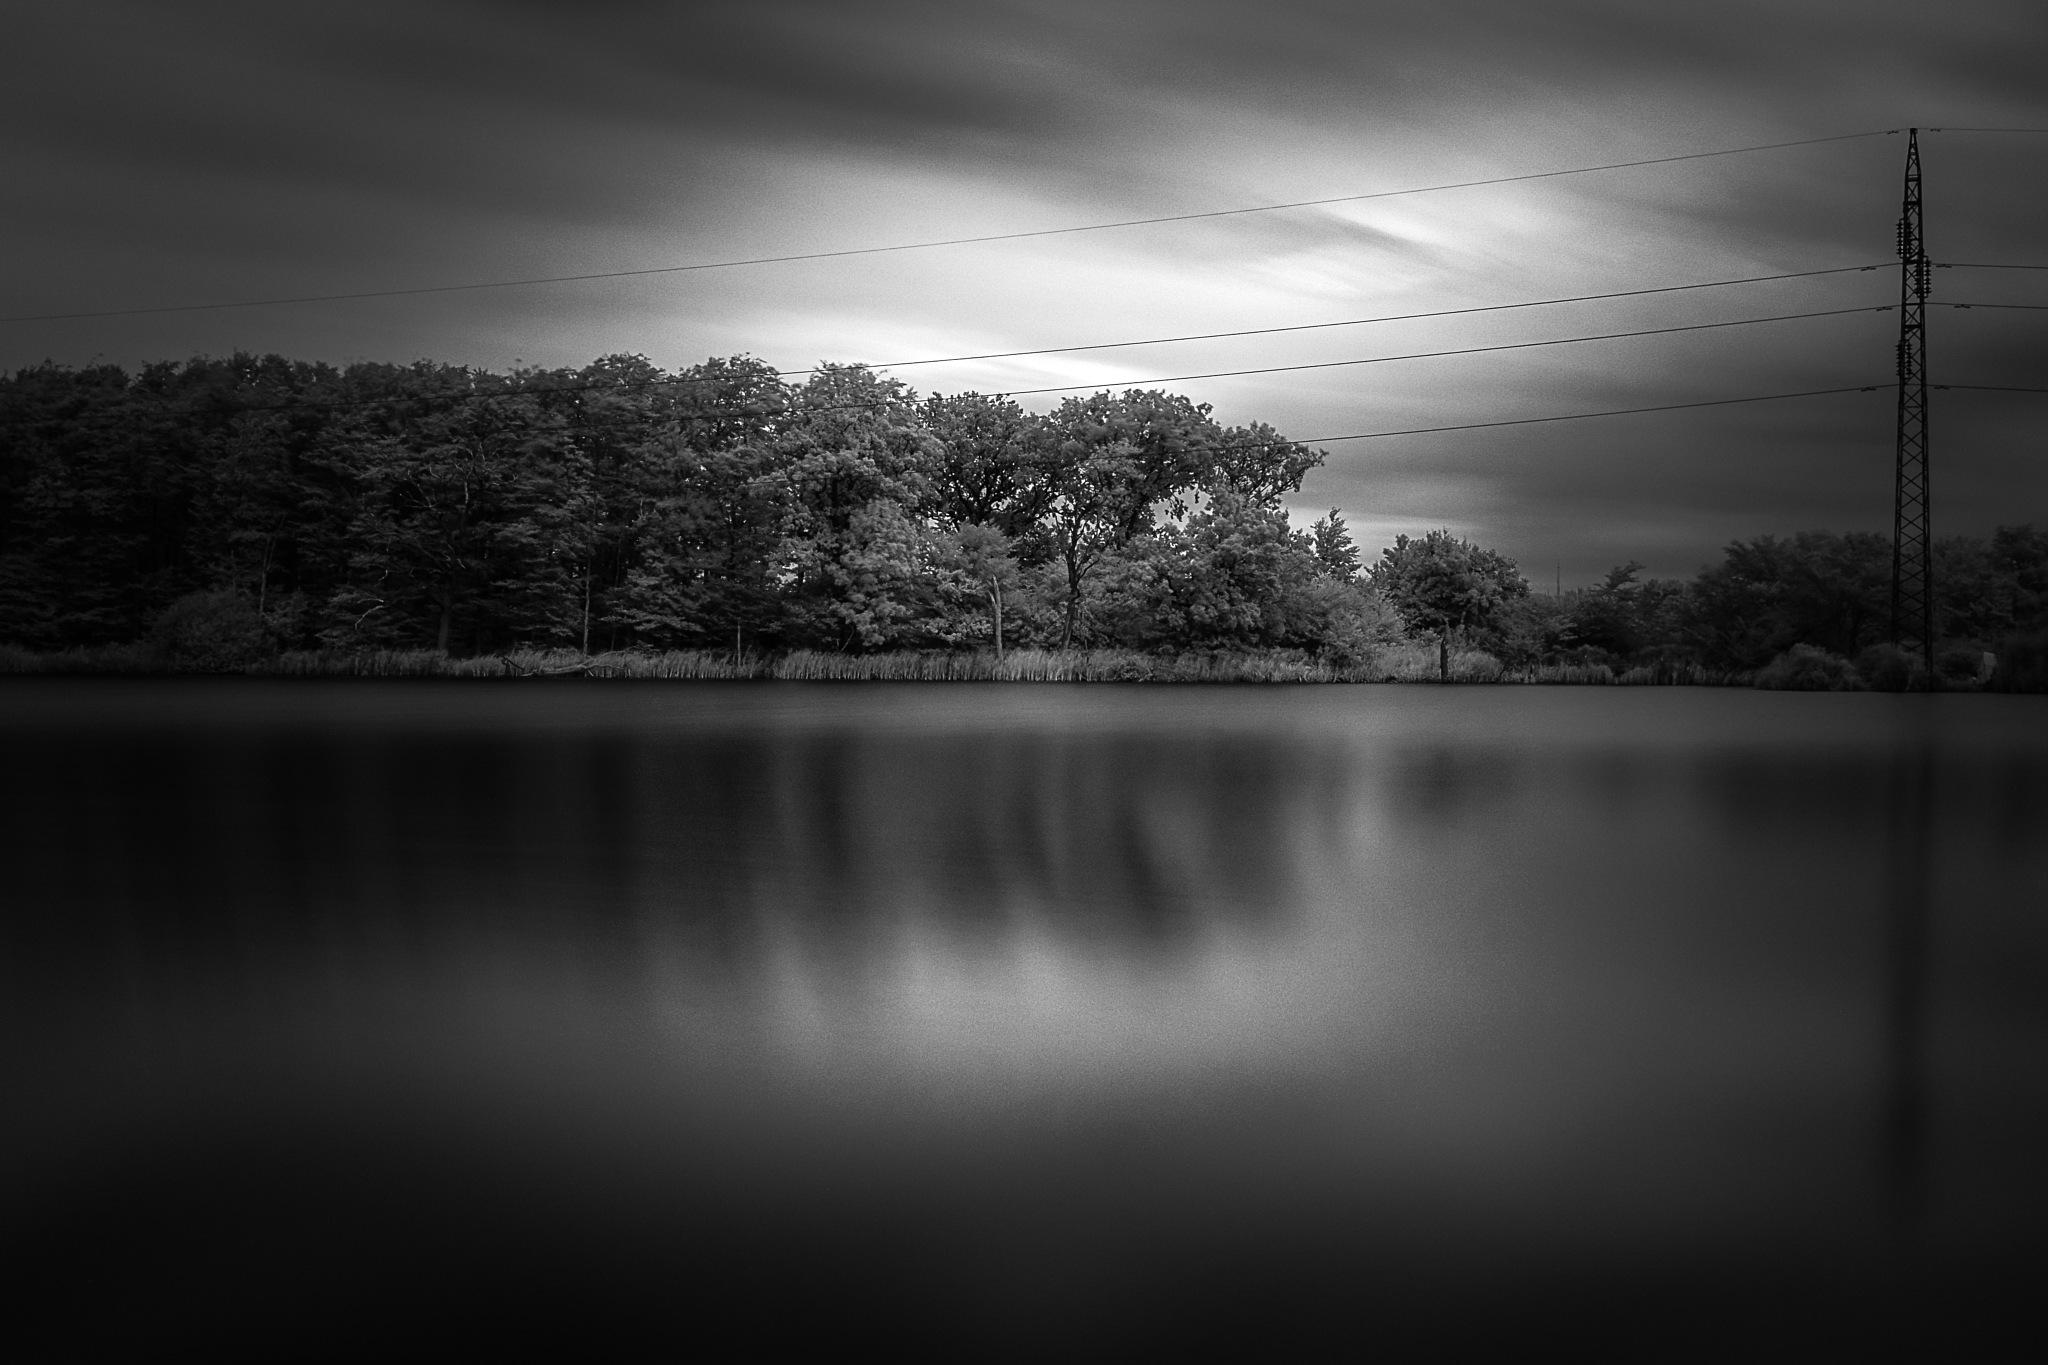 The lake by Michael B. Rasmussen